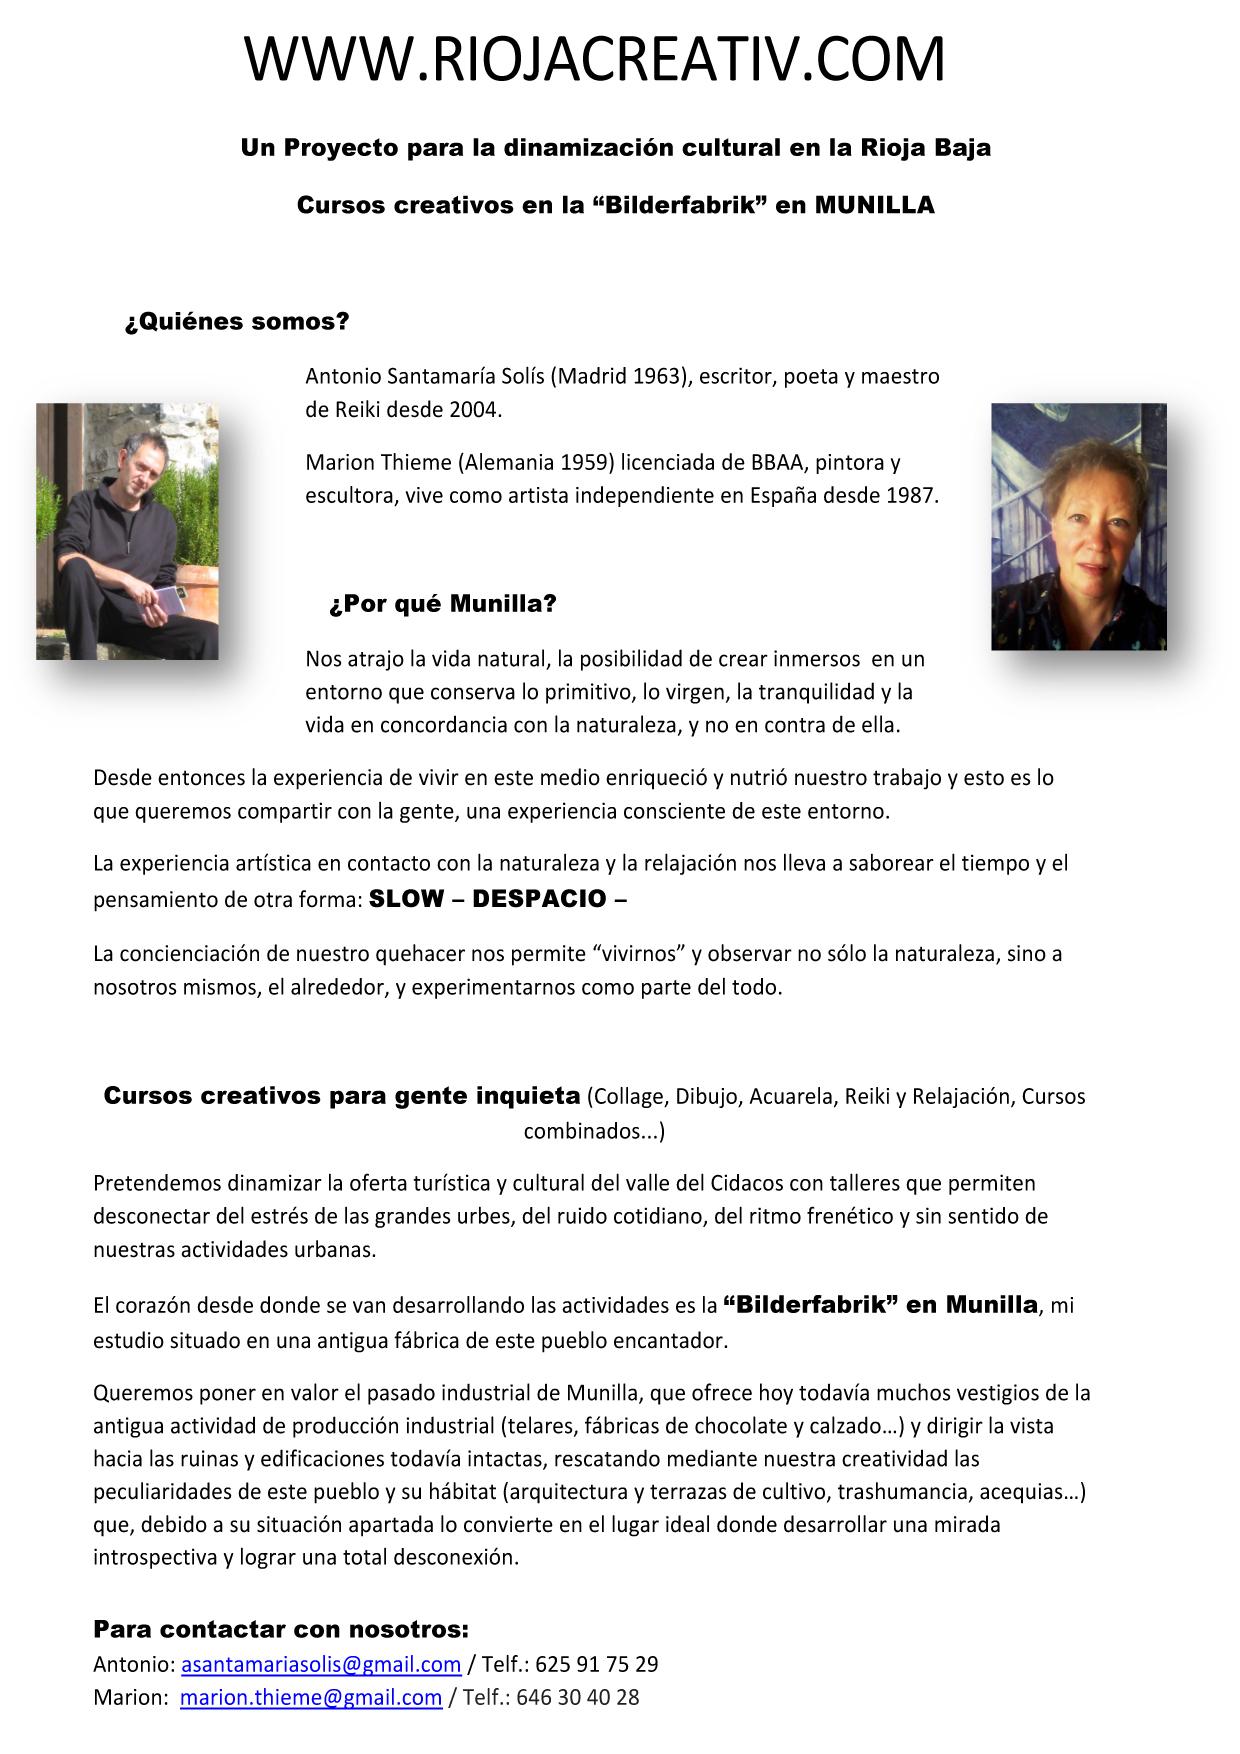 Microsoft Word - riojacreativ.docx